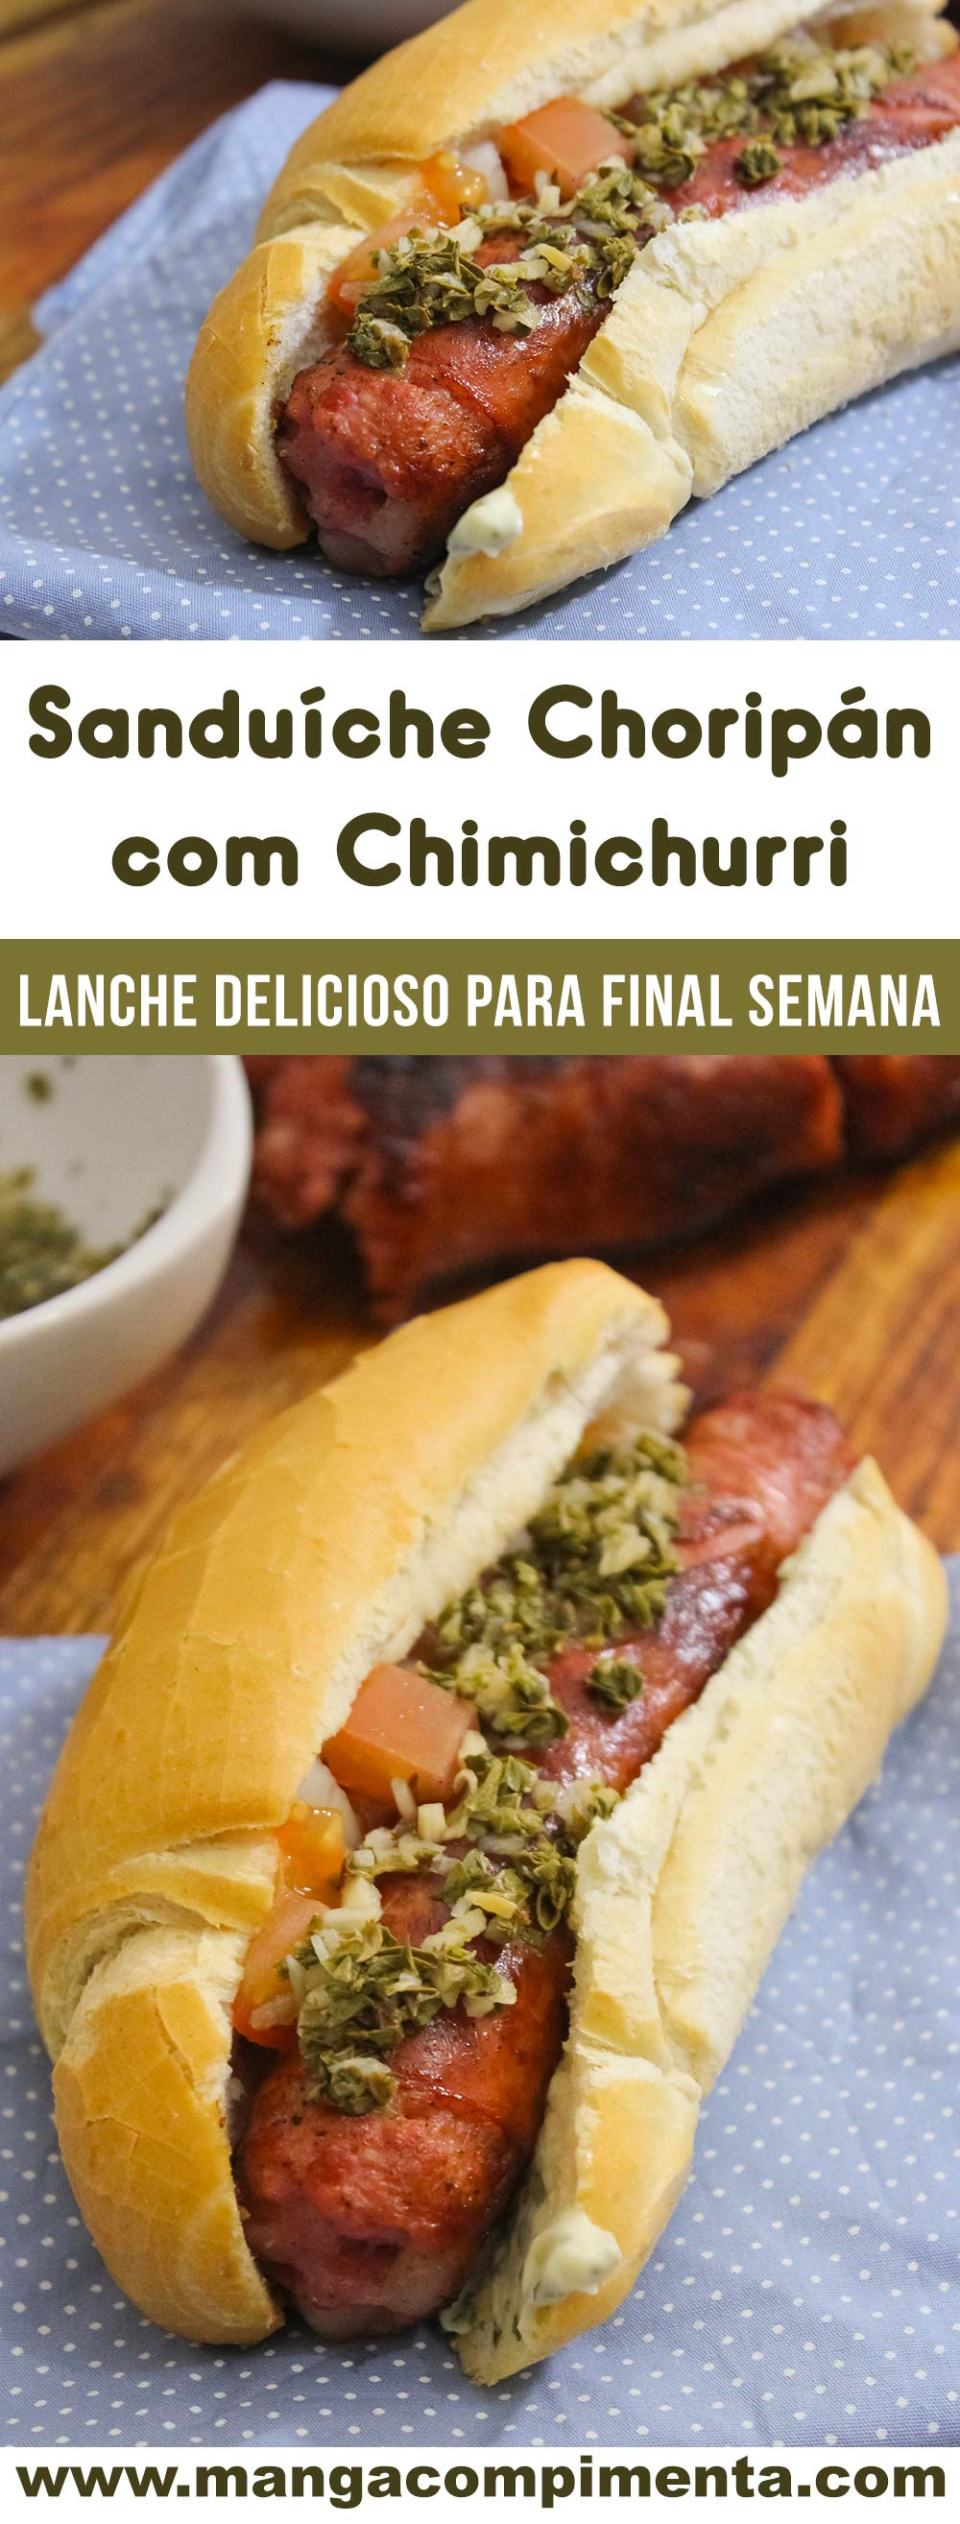 Sanduíche Choripán com Chimichurri - Um lanche delicioso para final de semana!